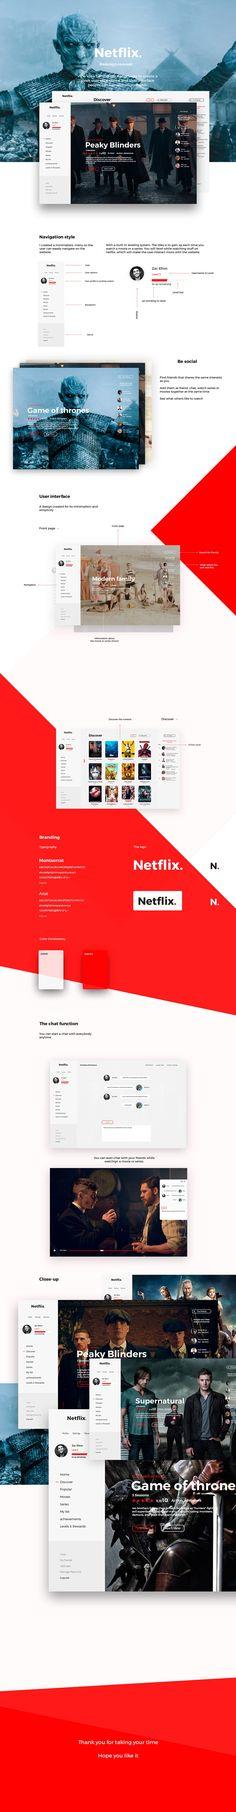 Redesign concepts for popular websites #5 — Muzli -Design Inspiration